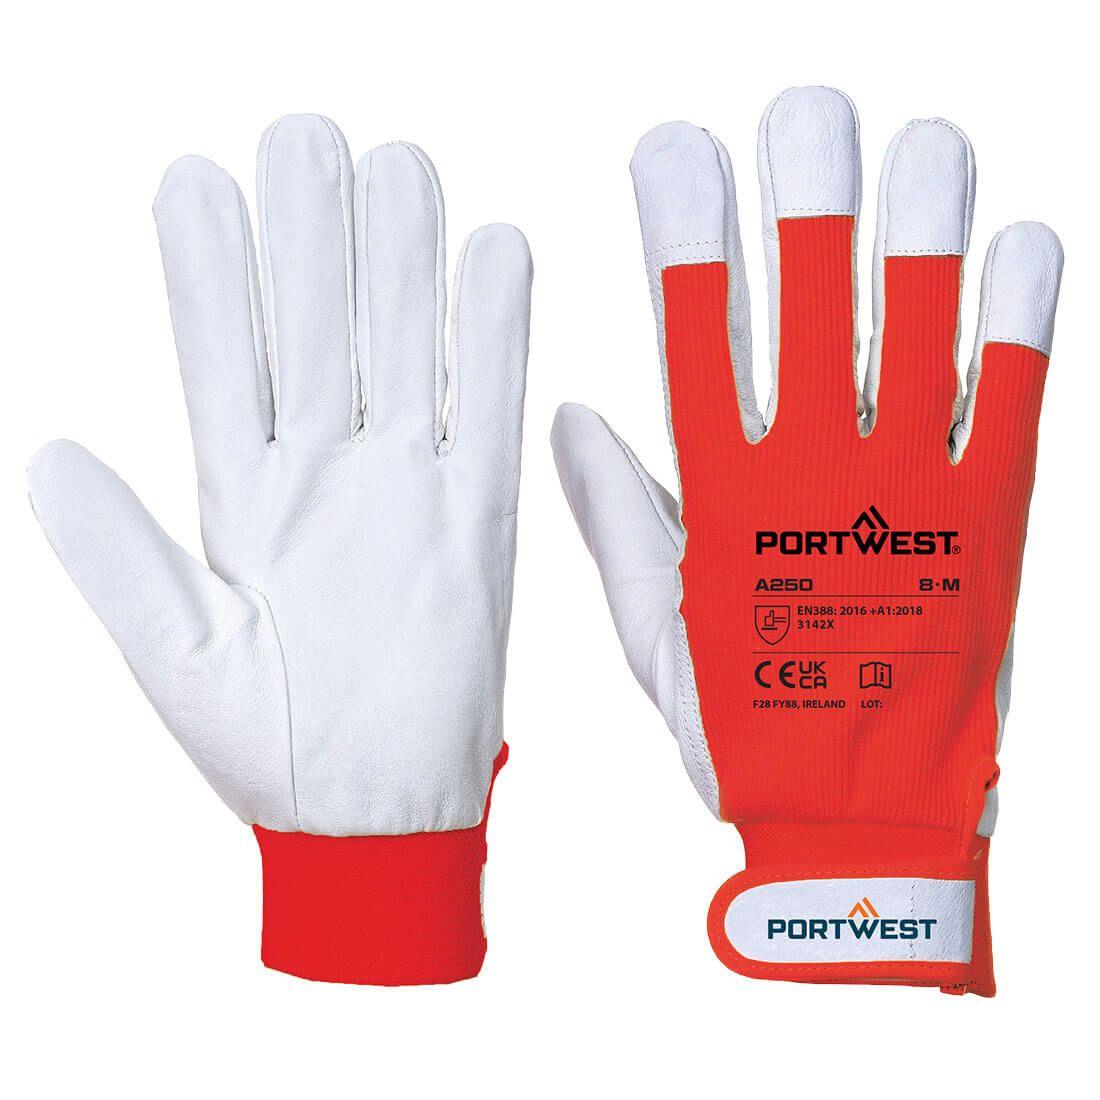 Portwest Handschoenen A250 rood(RE)